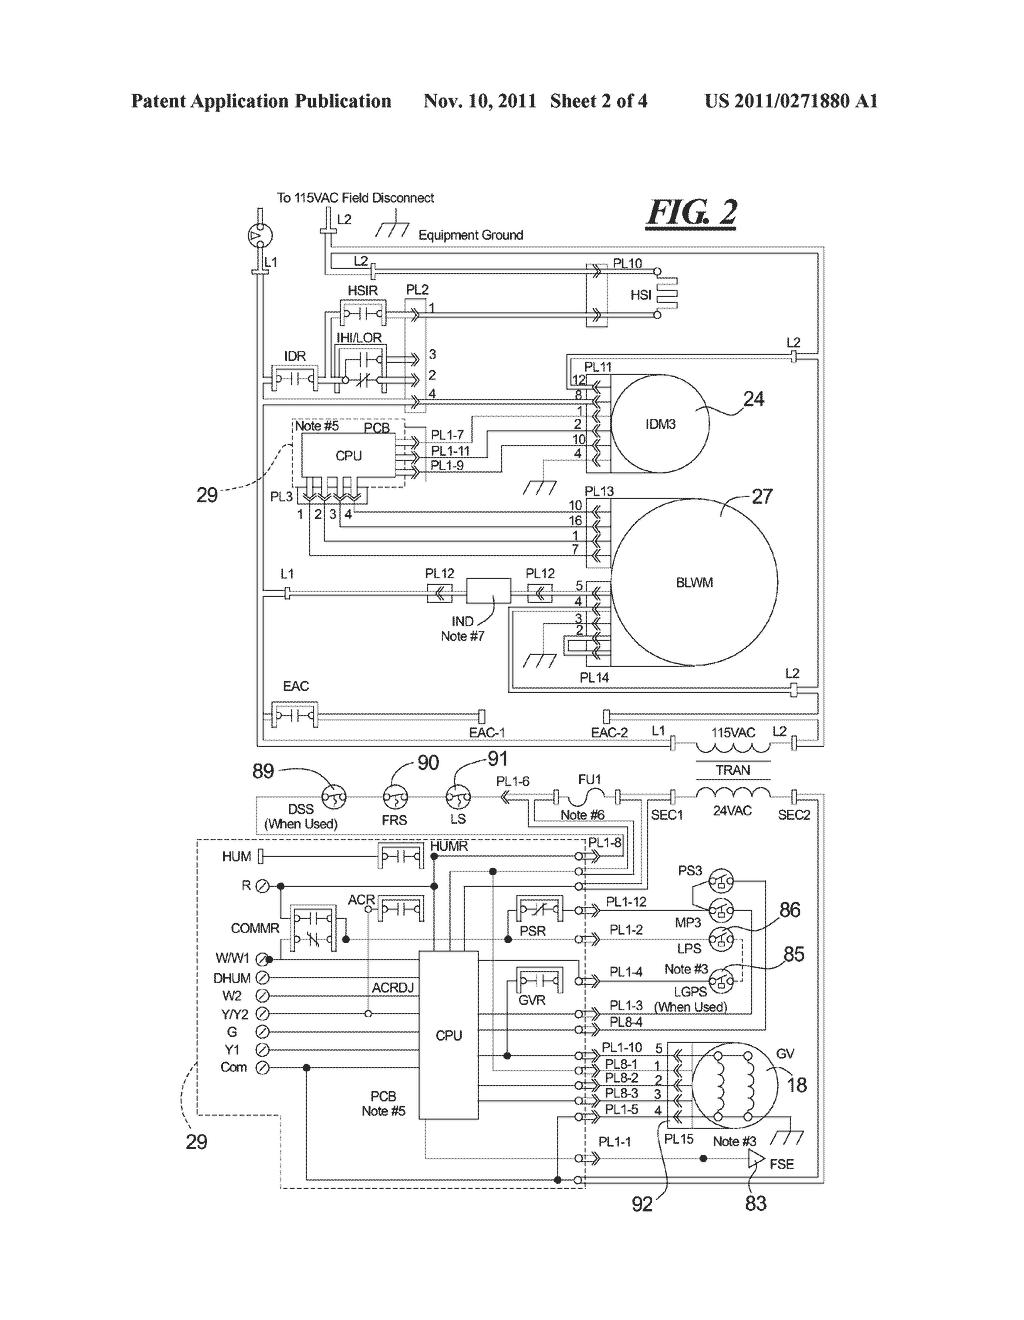 Gas Valve Wiring Schematic - wiring-car-auto13.1ab.slt-legal.fr Furnace Gas Valve Wiring Diagram slt-legal.fr